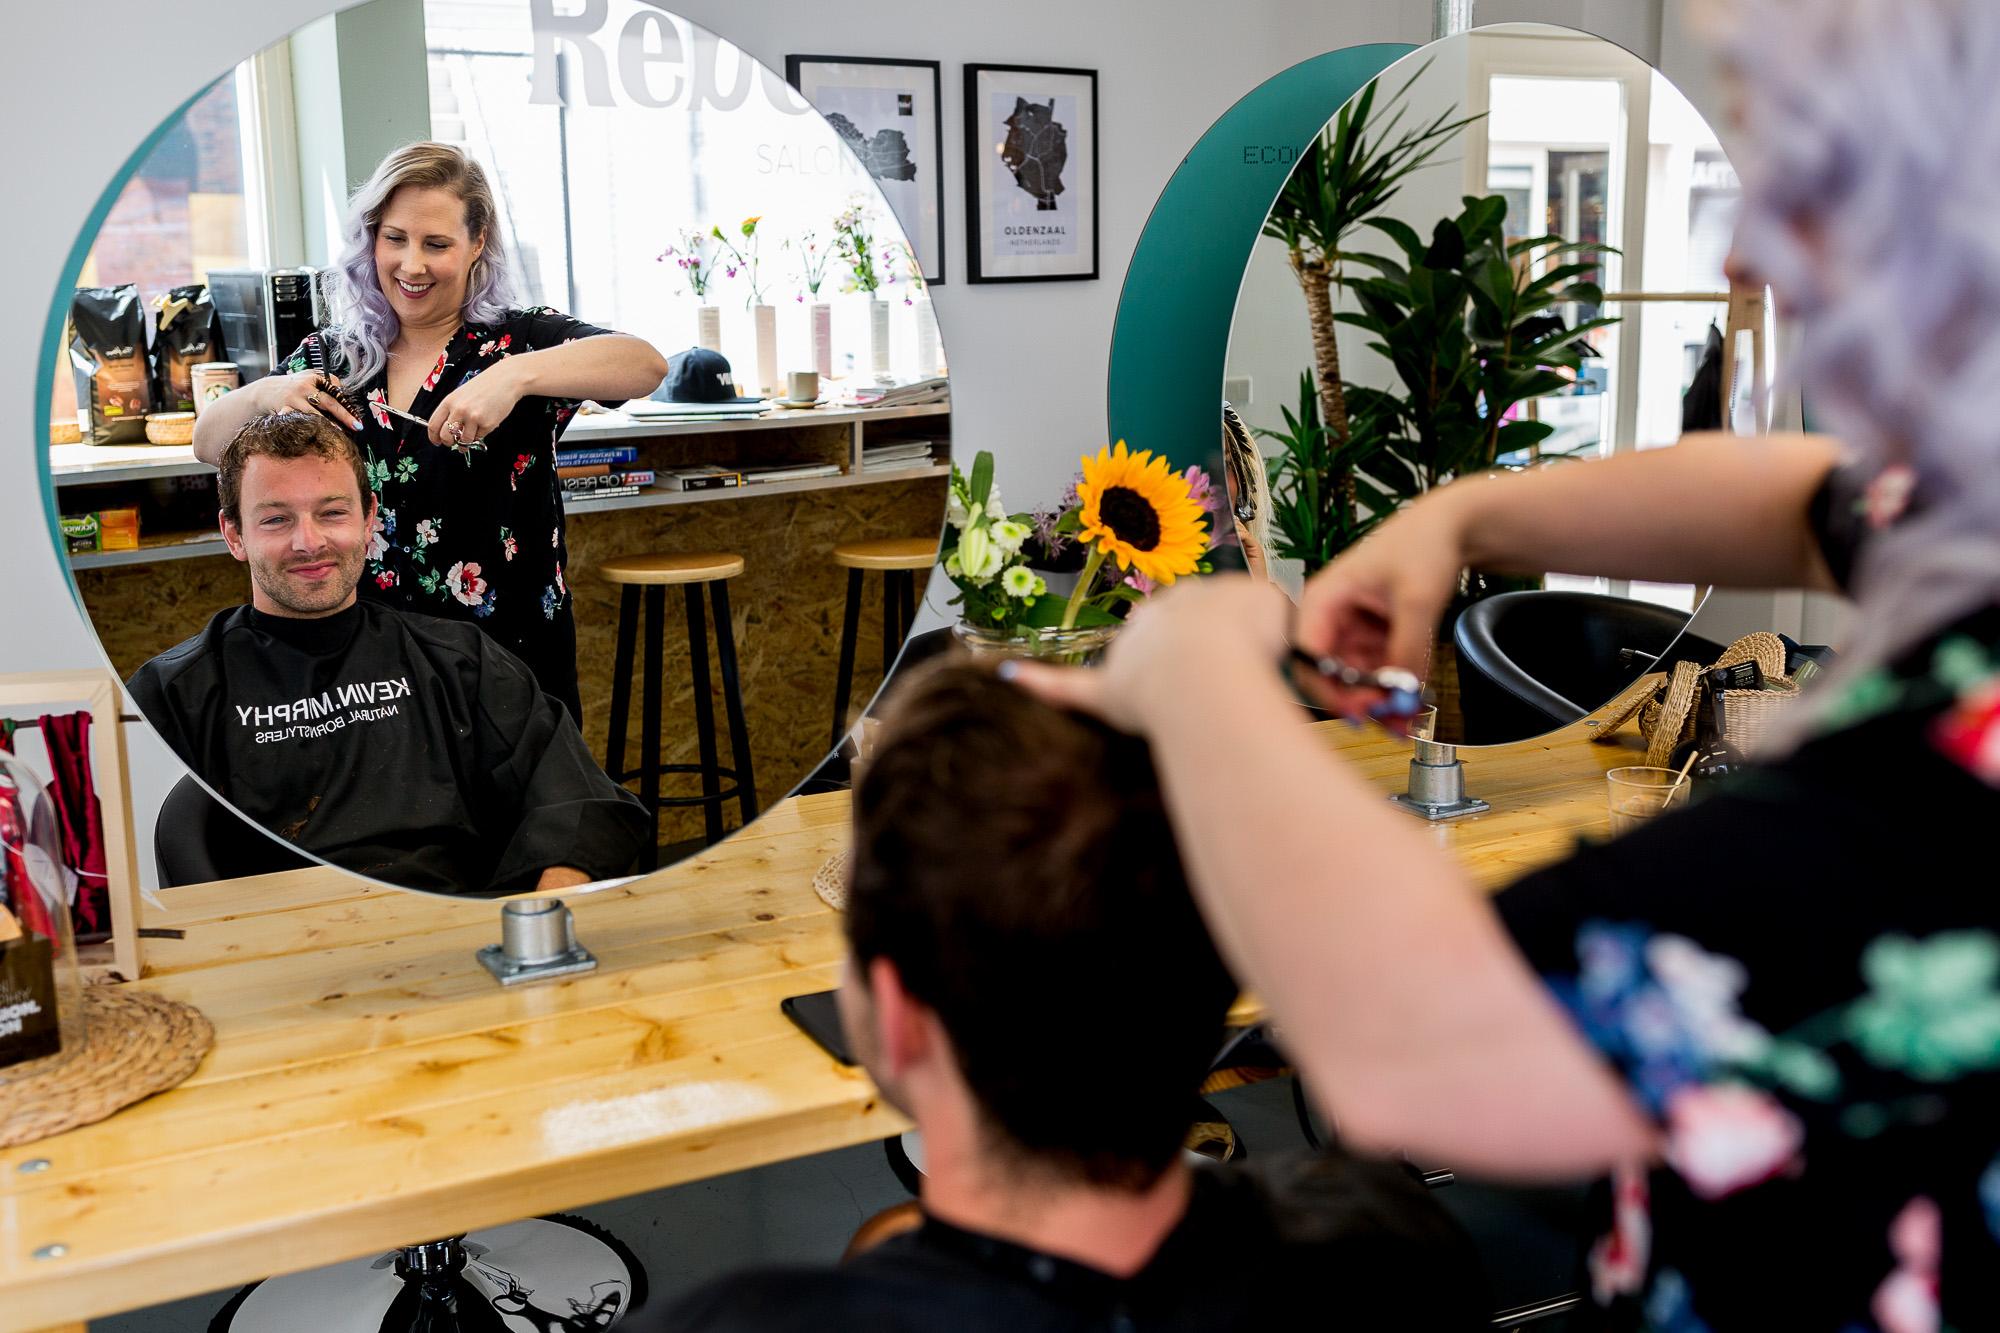 Bedrijfsfotografie | Salon Rebel